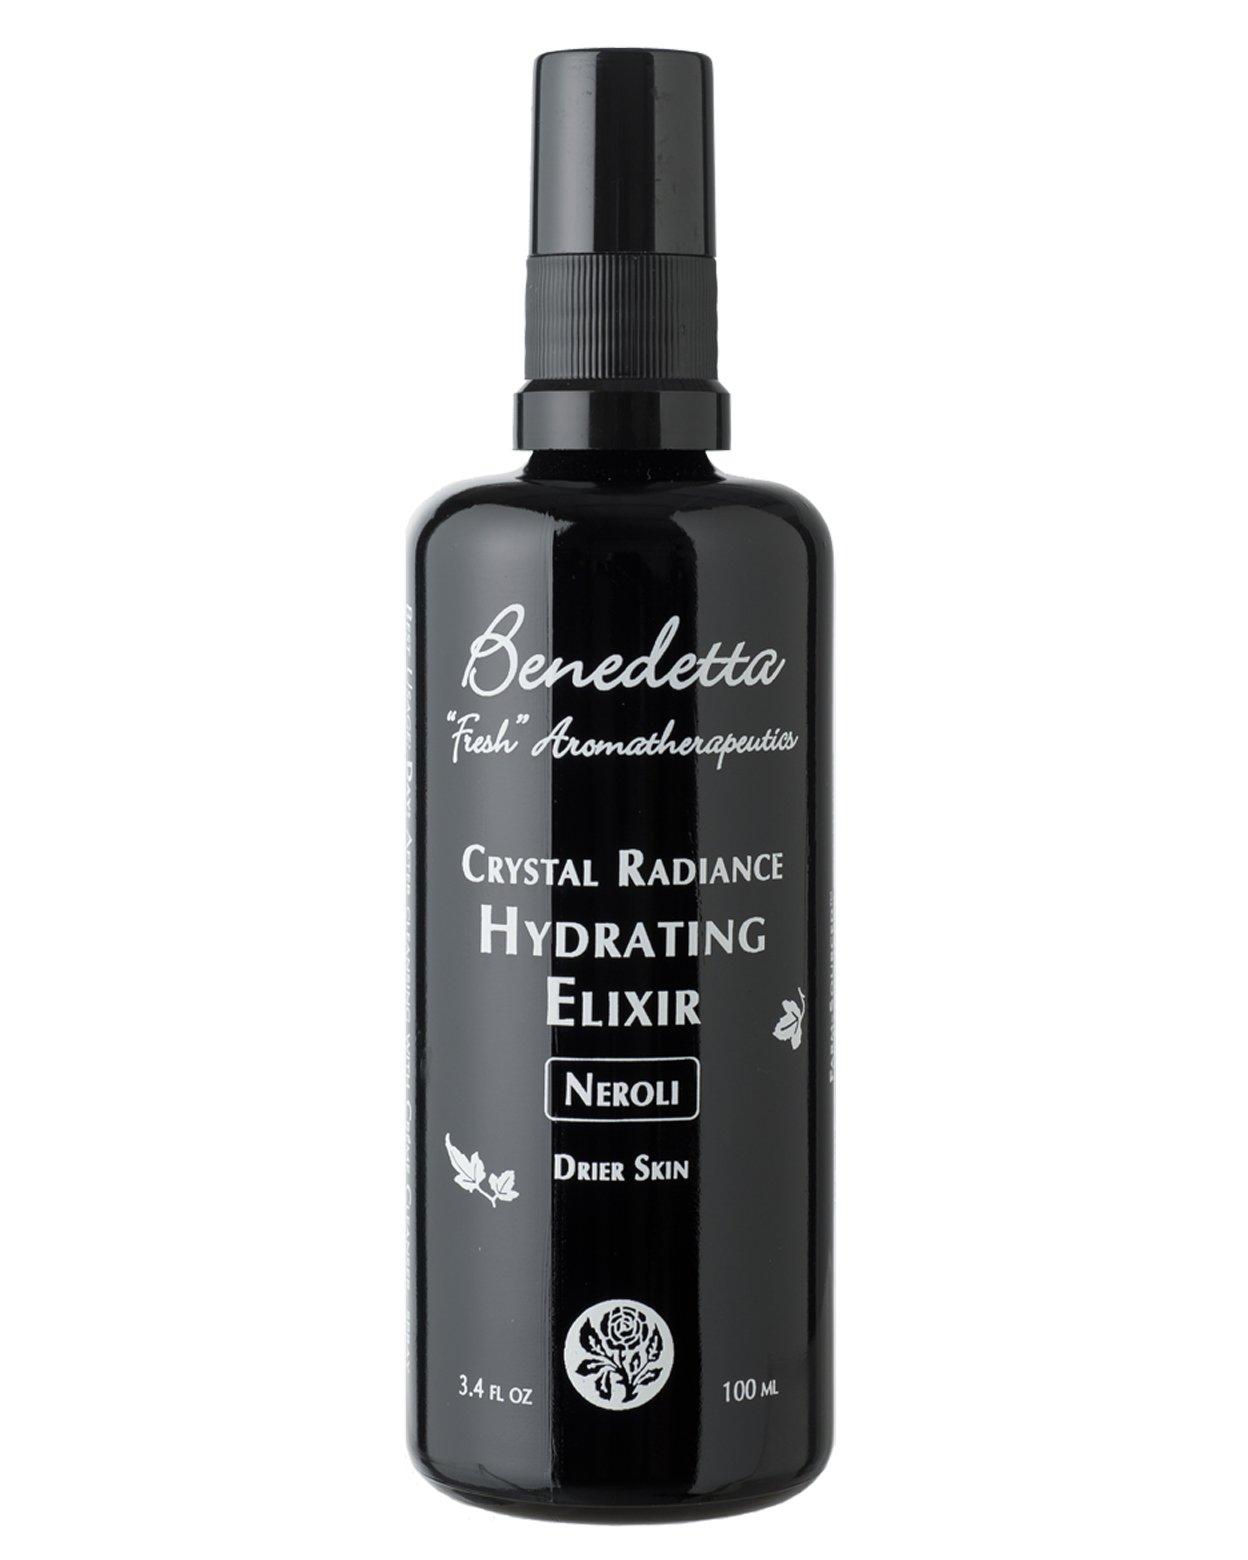 Benedetta Crystal Radiance Hydrating Elixir - Neroli for Drier Skin - 3.4 oz (100 ml)